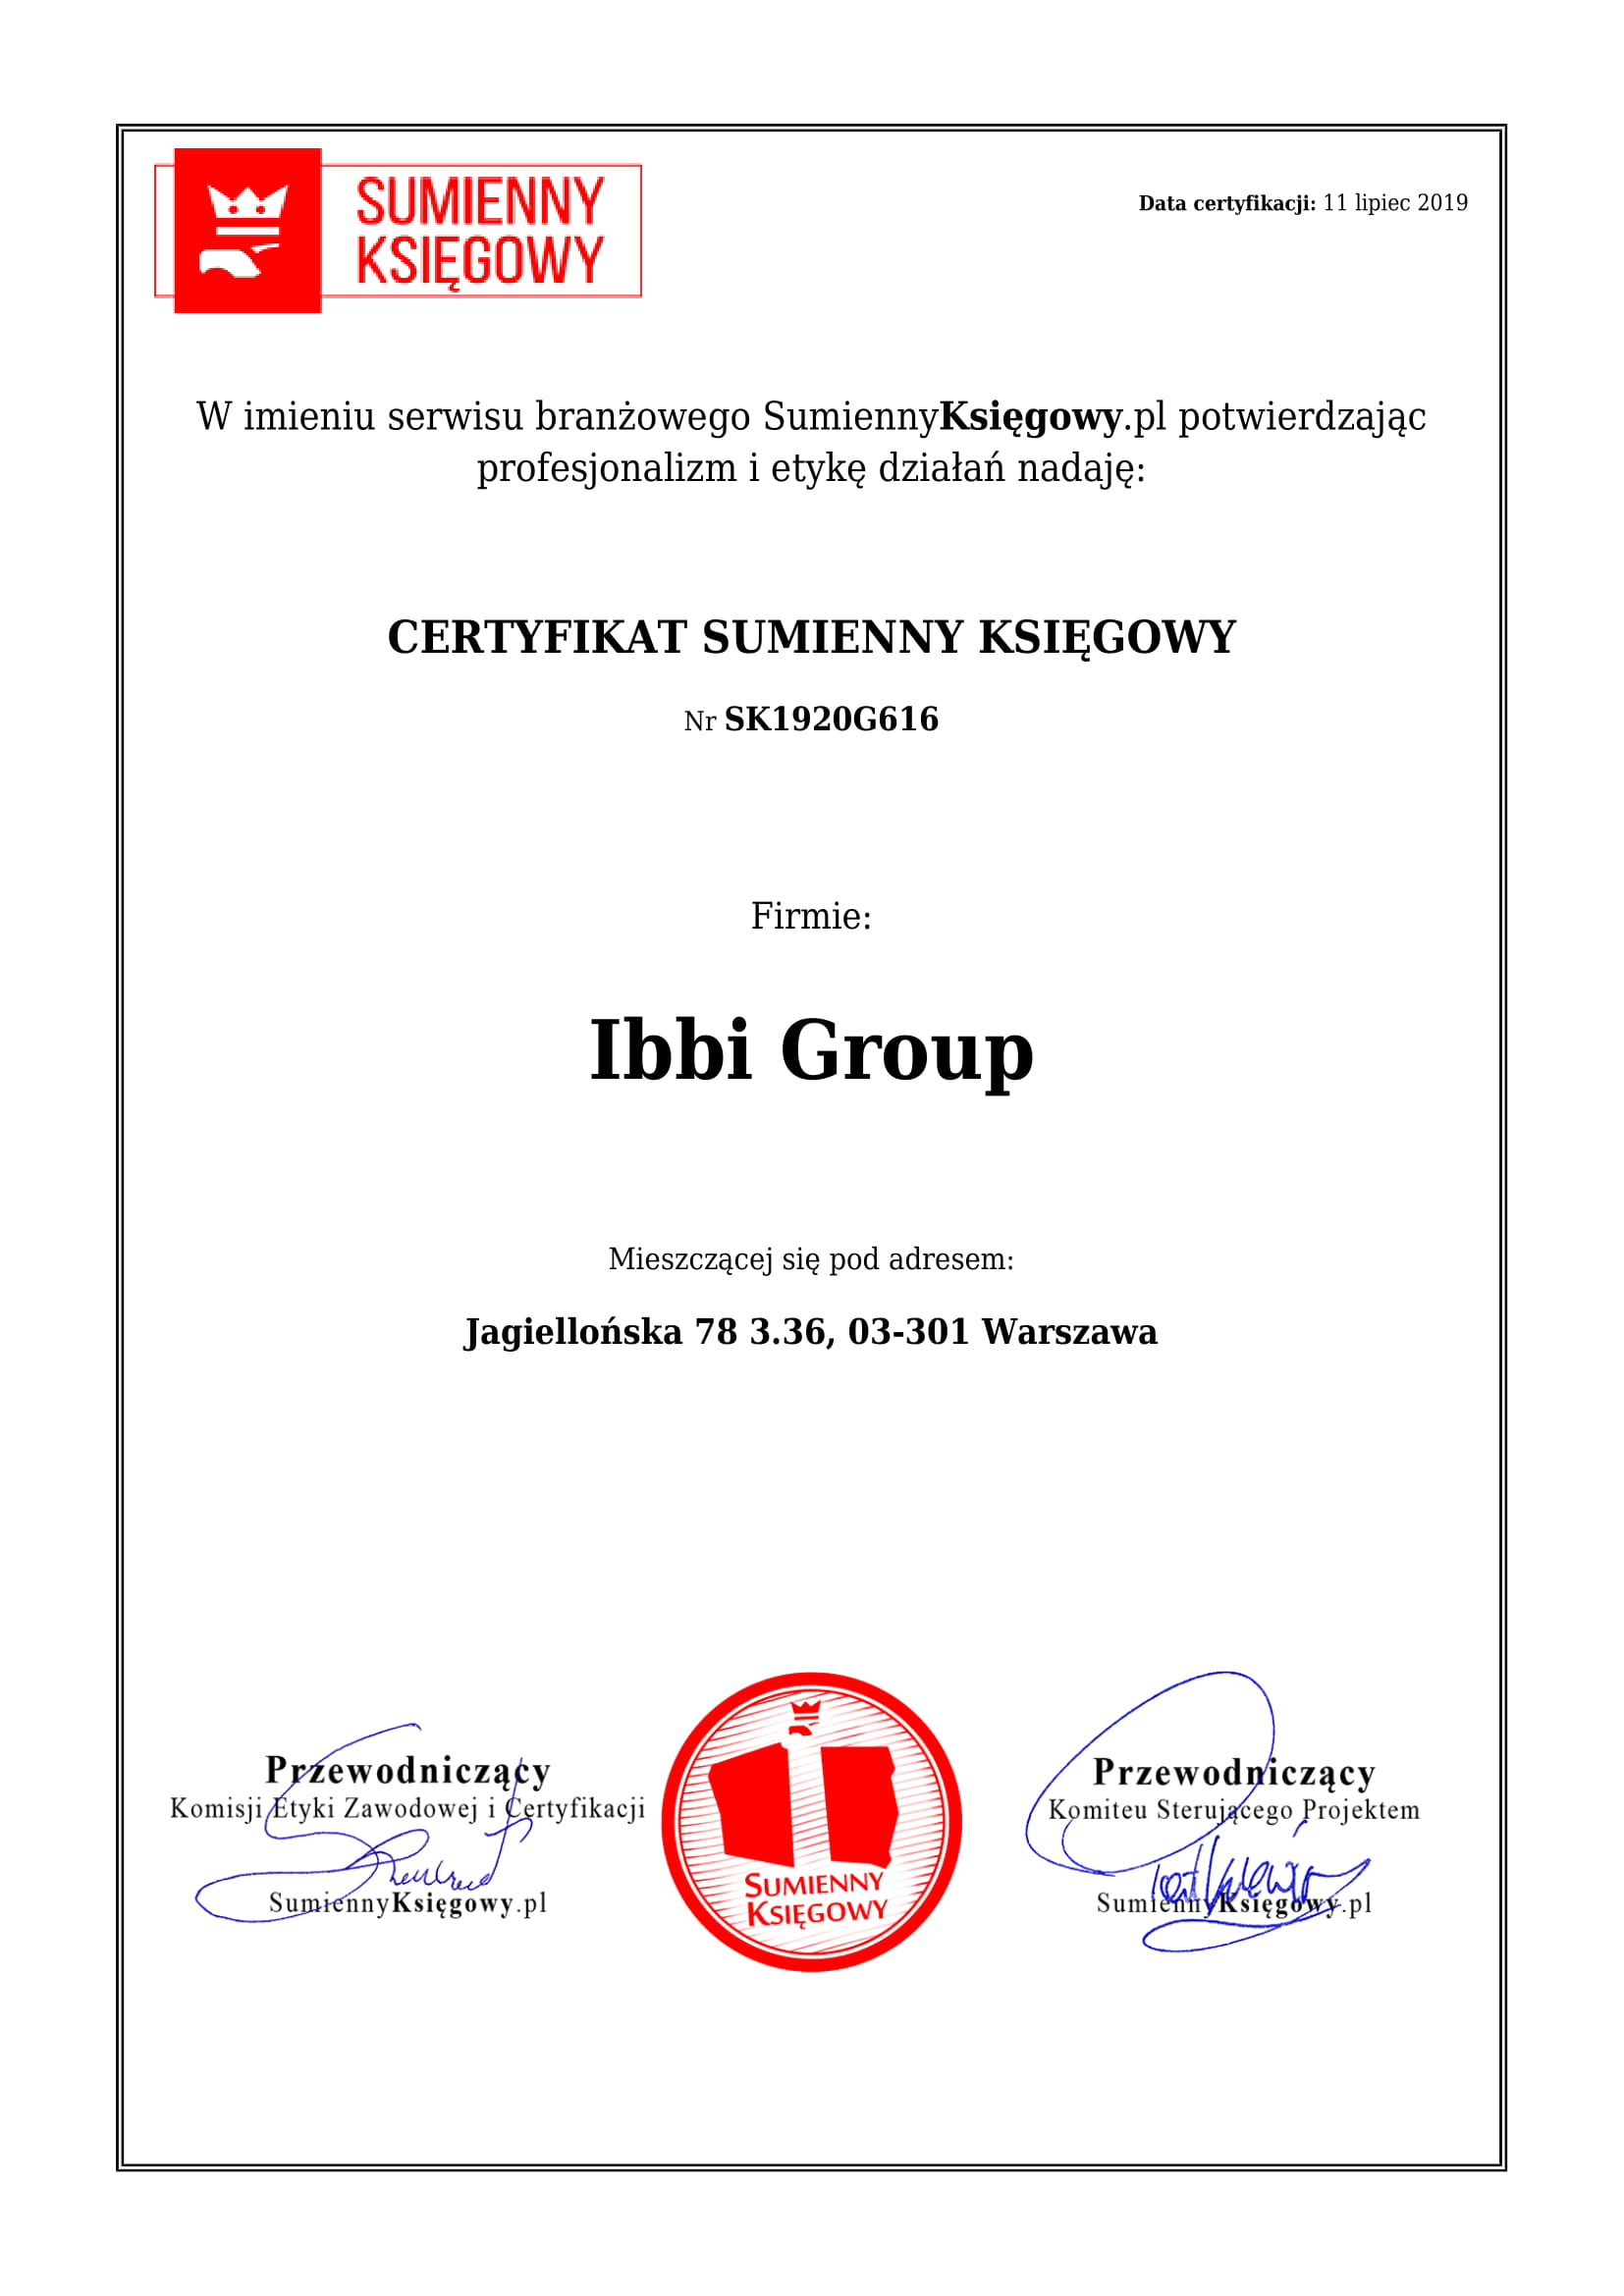 Certyfikat Ibbi Group